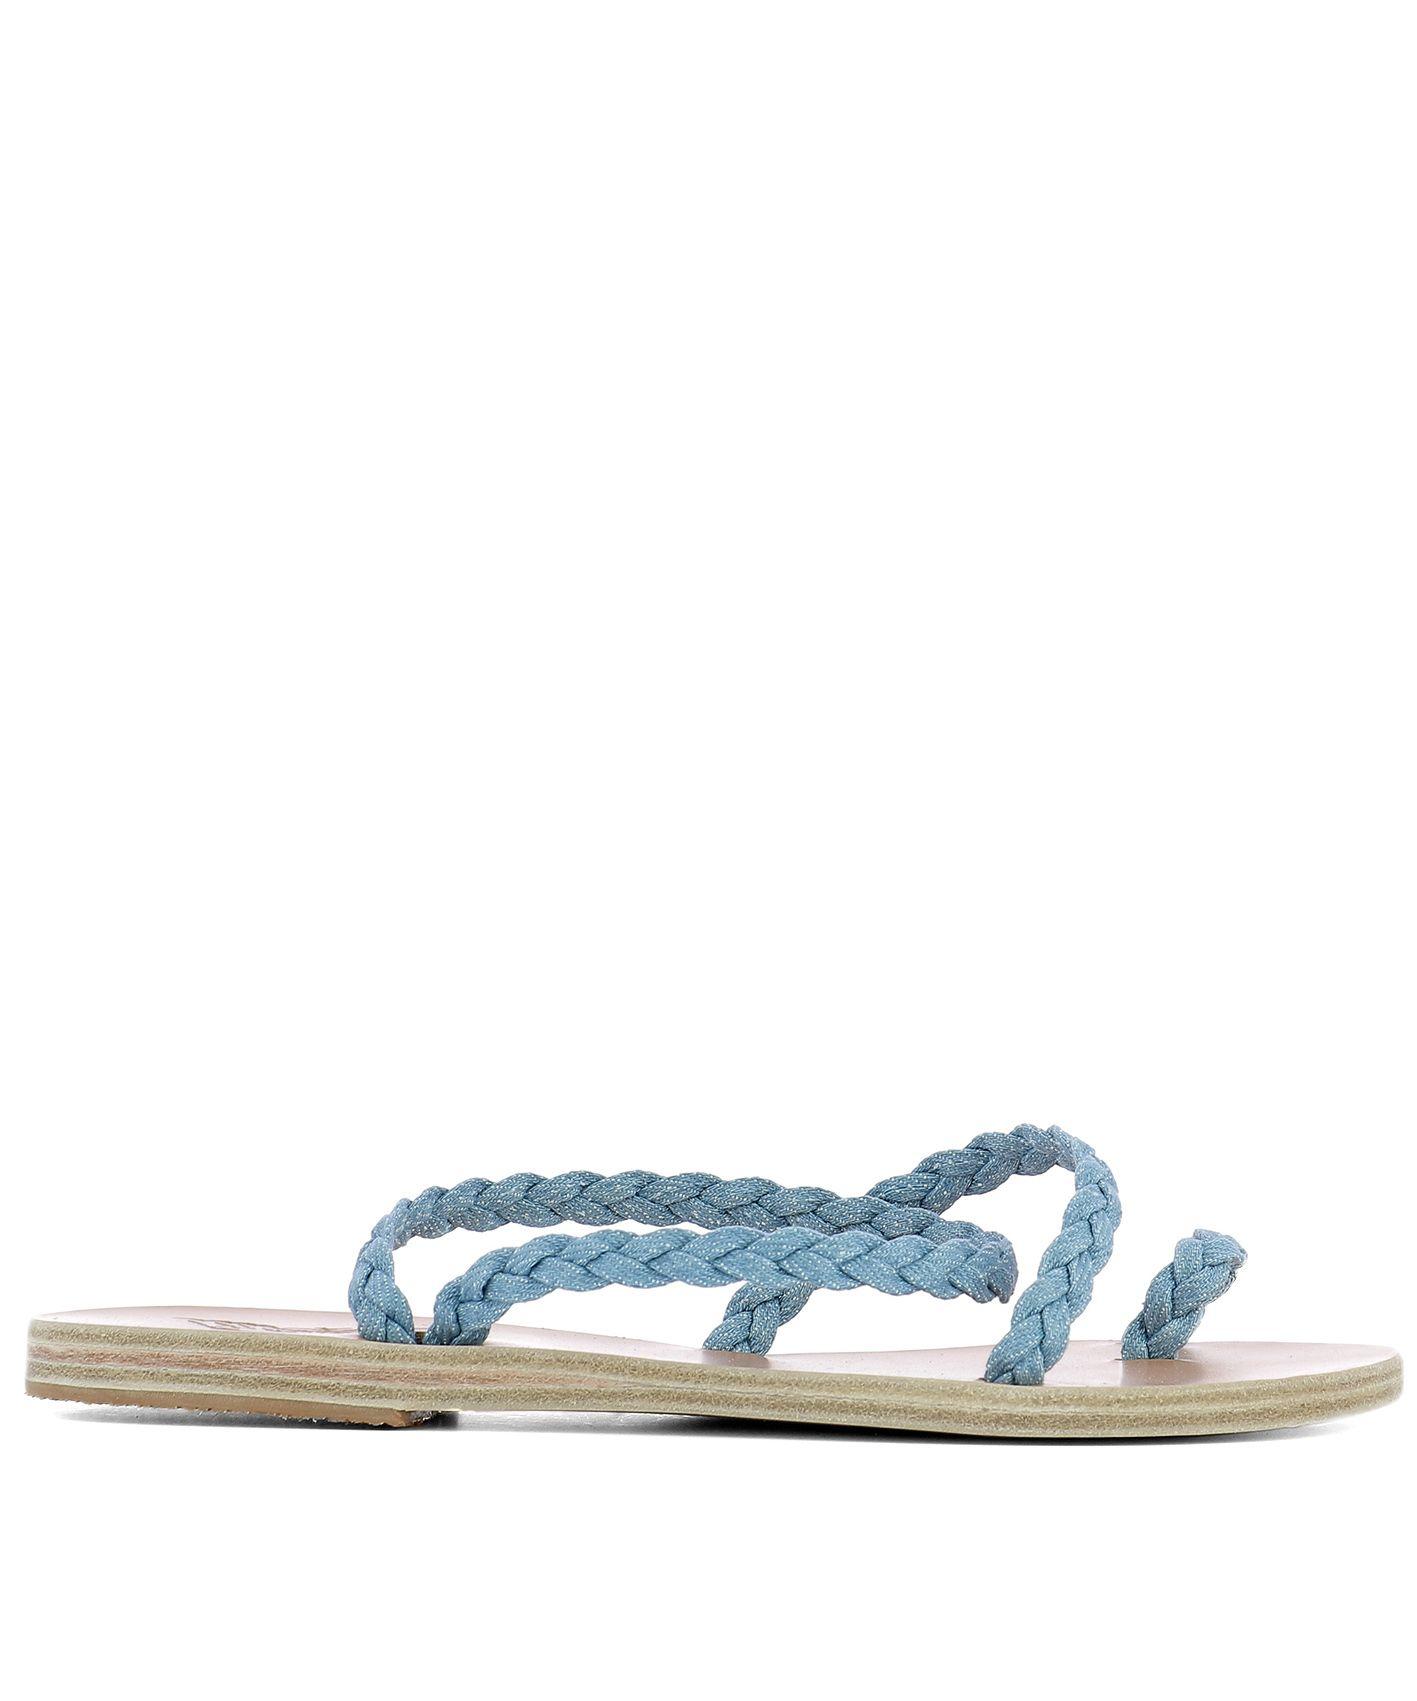 Light Blue Fabric Sandals